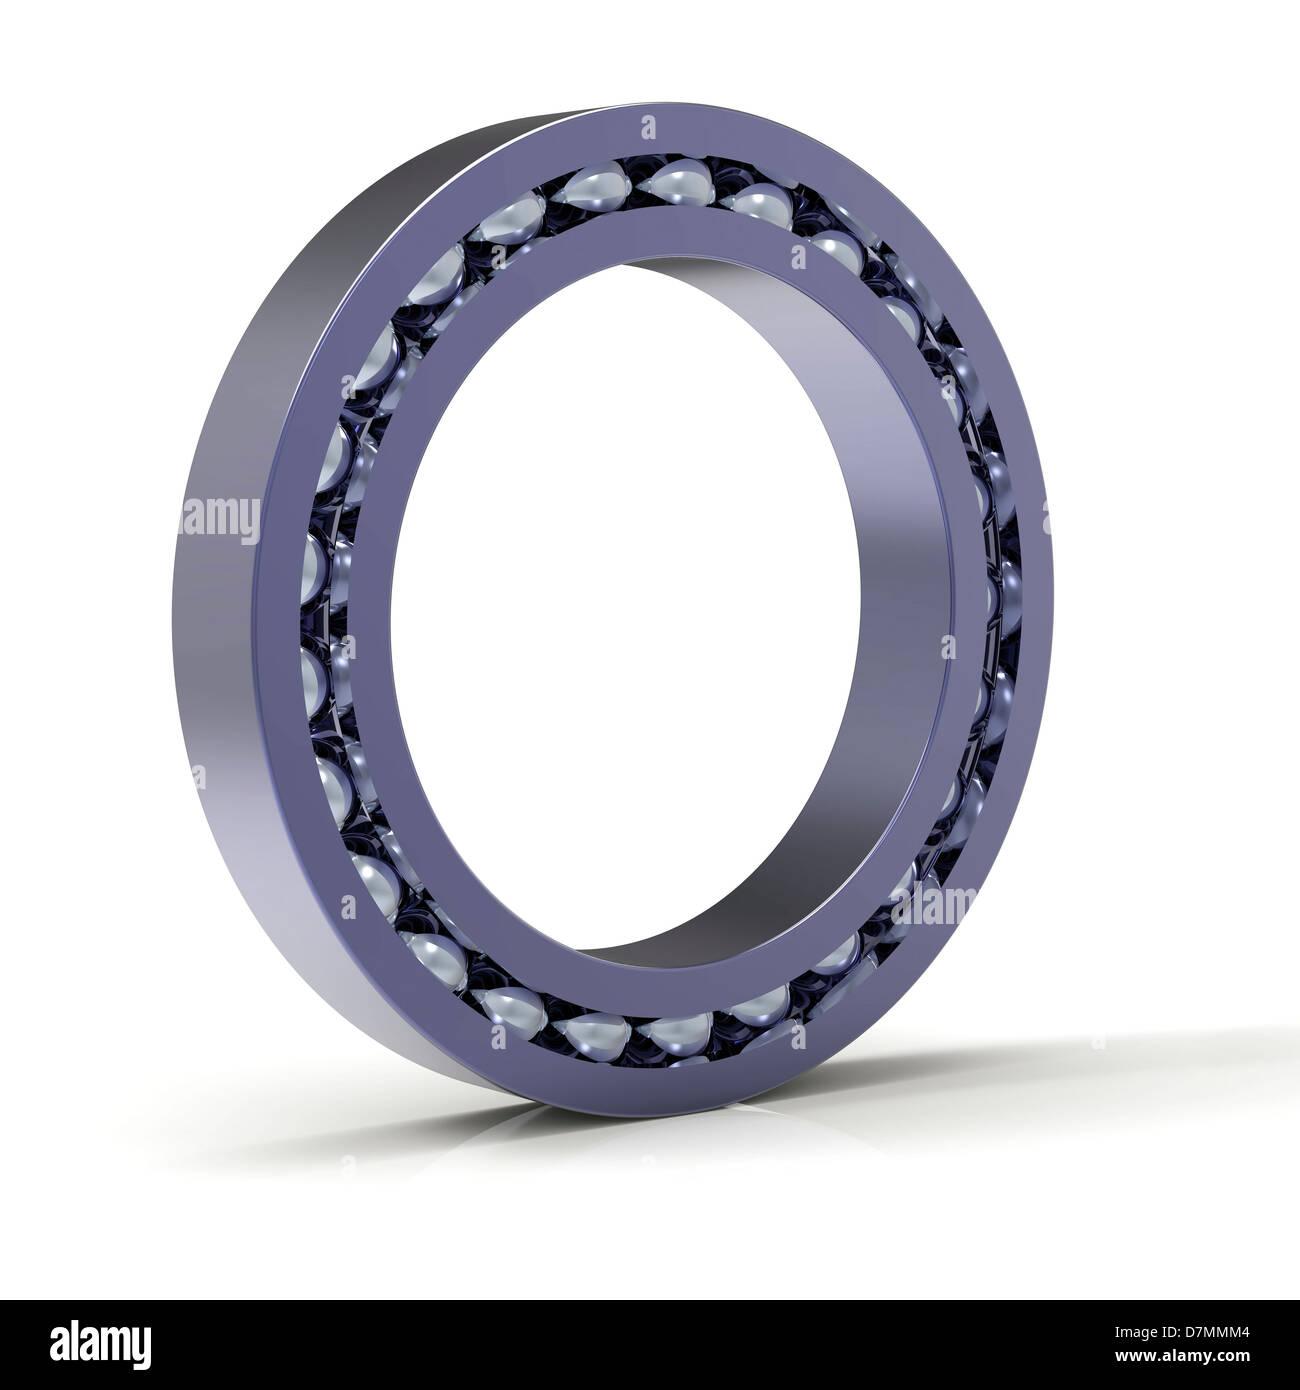 Roller bearing, artwork - Stock Image